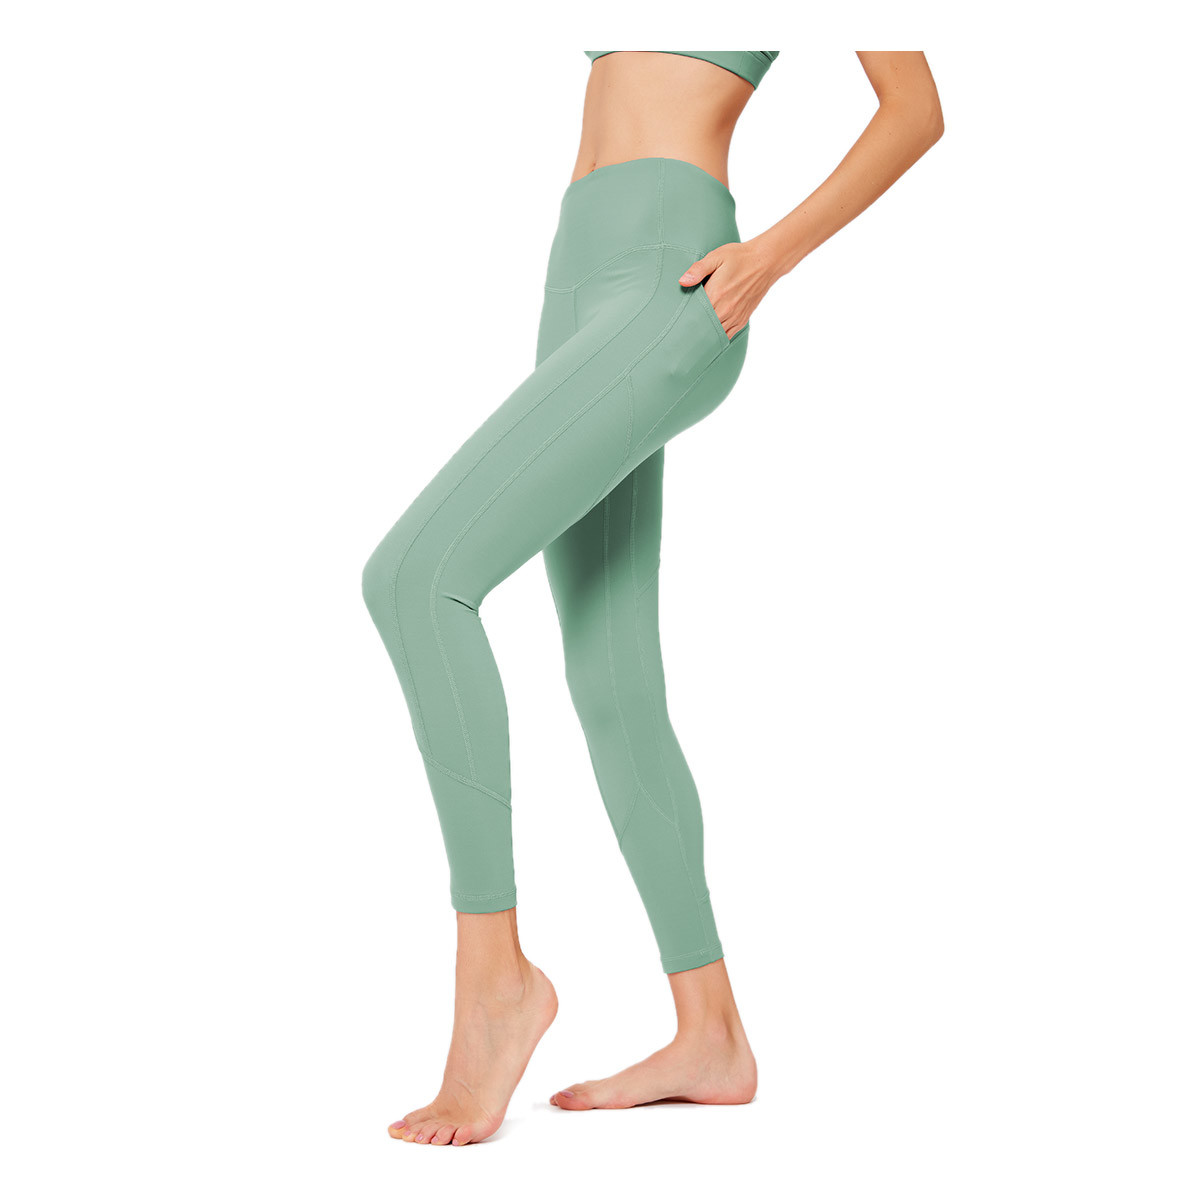 Custom Women's Color Slashed Leggings Nylon Spandex Lycra Fabric Material